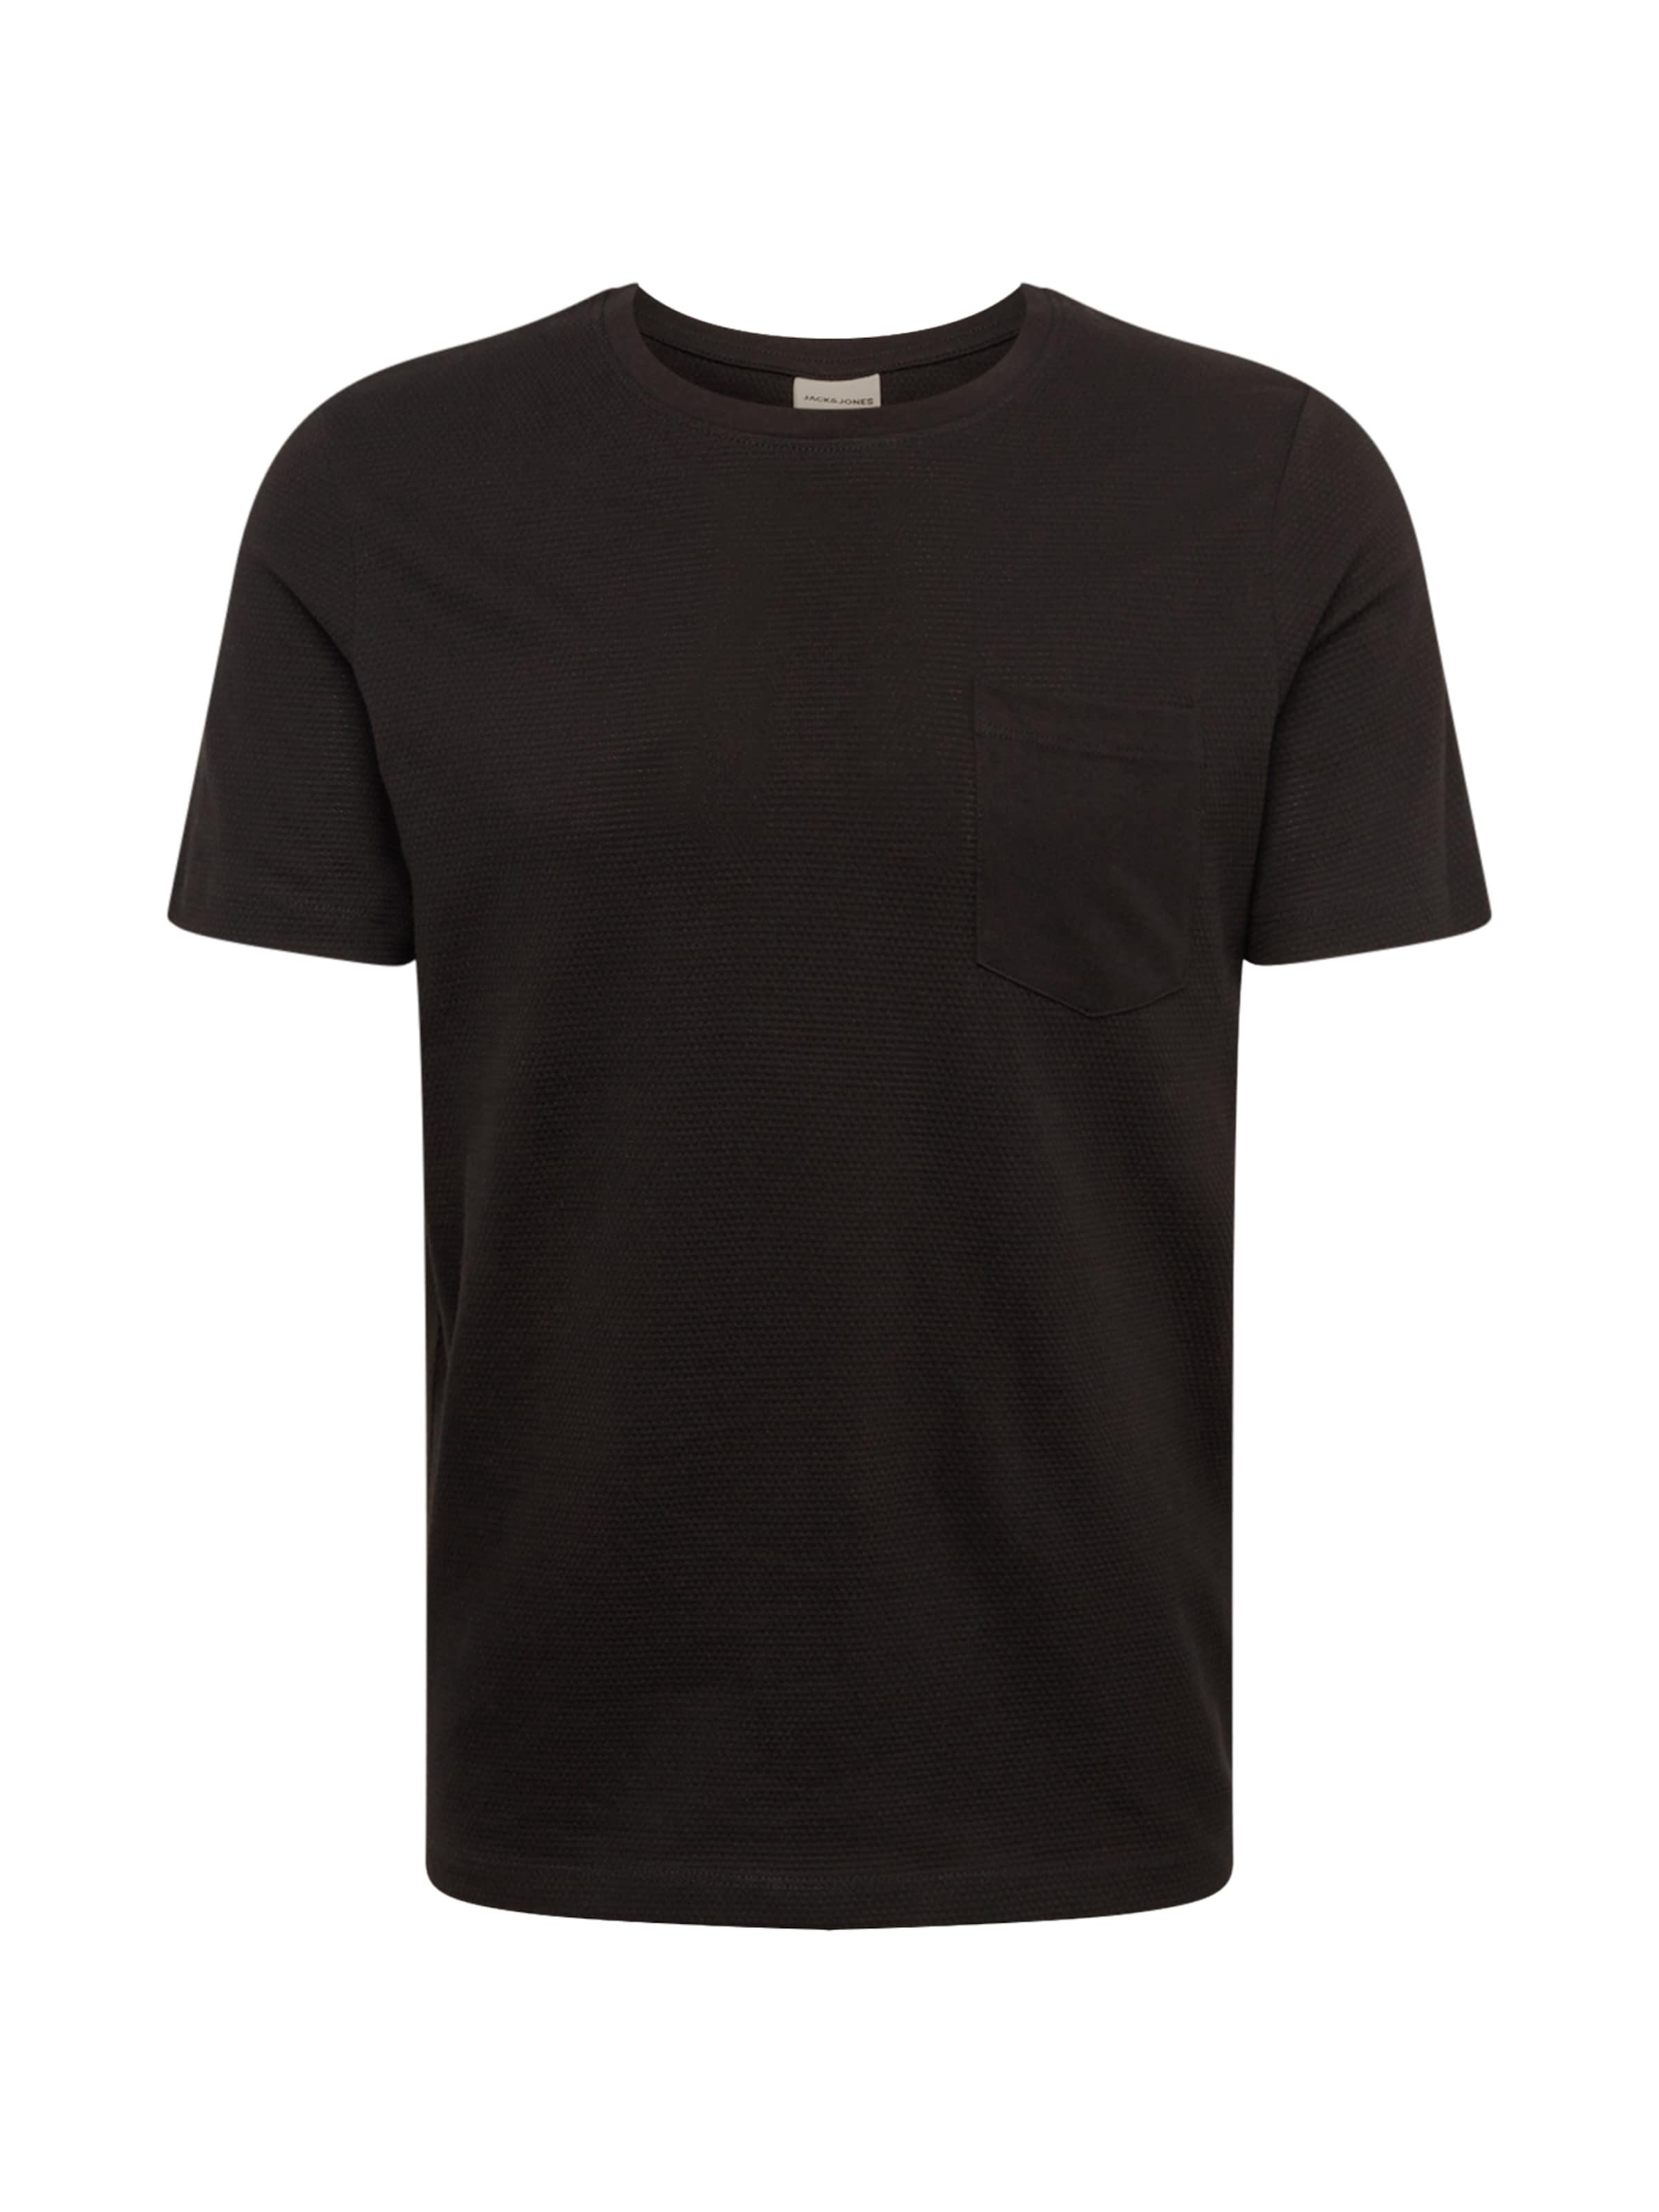 Blanc En T 'like' Jackamp; Jones shirt qzVpSUMG